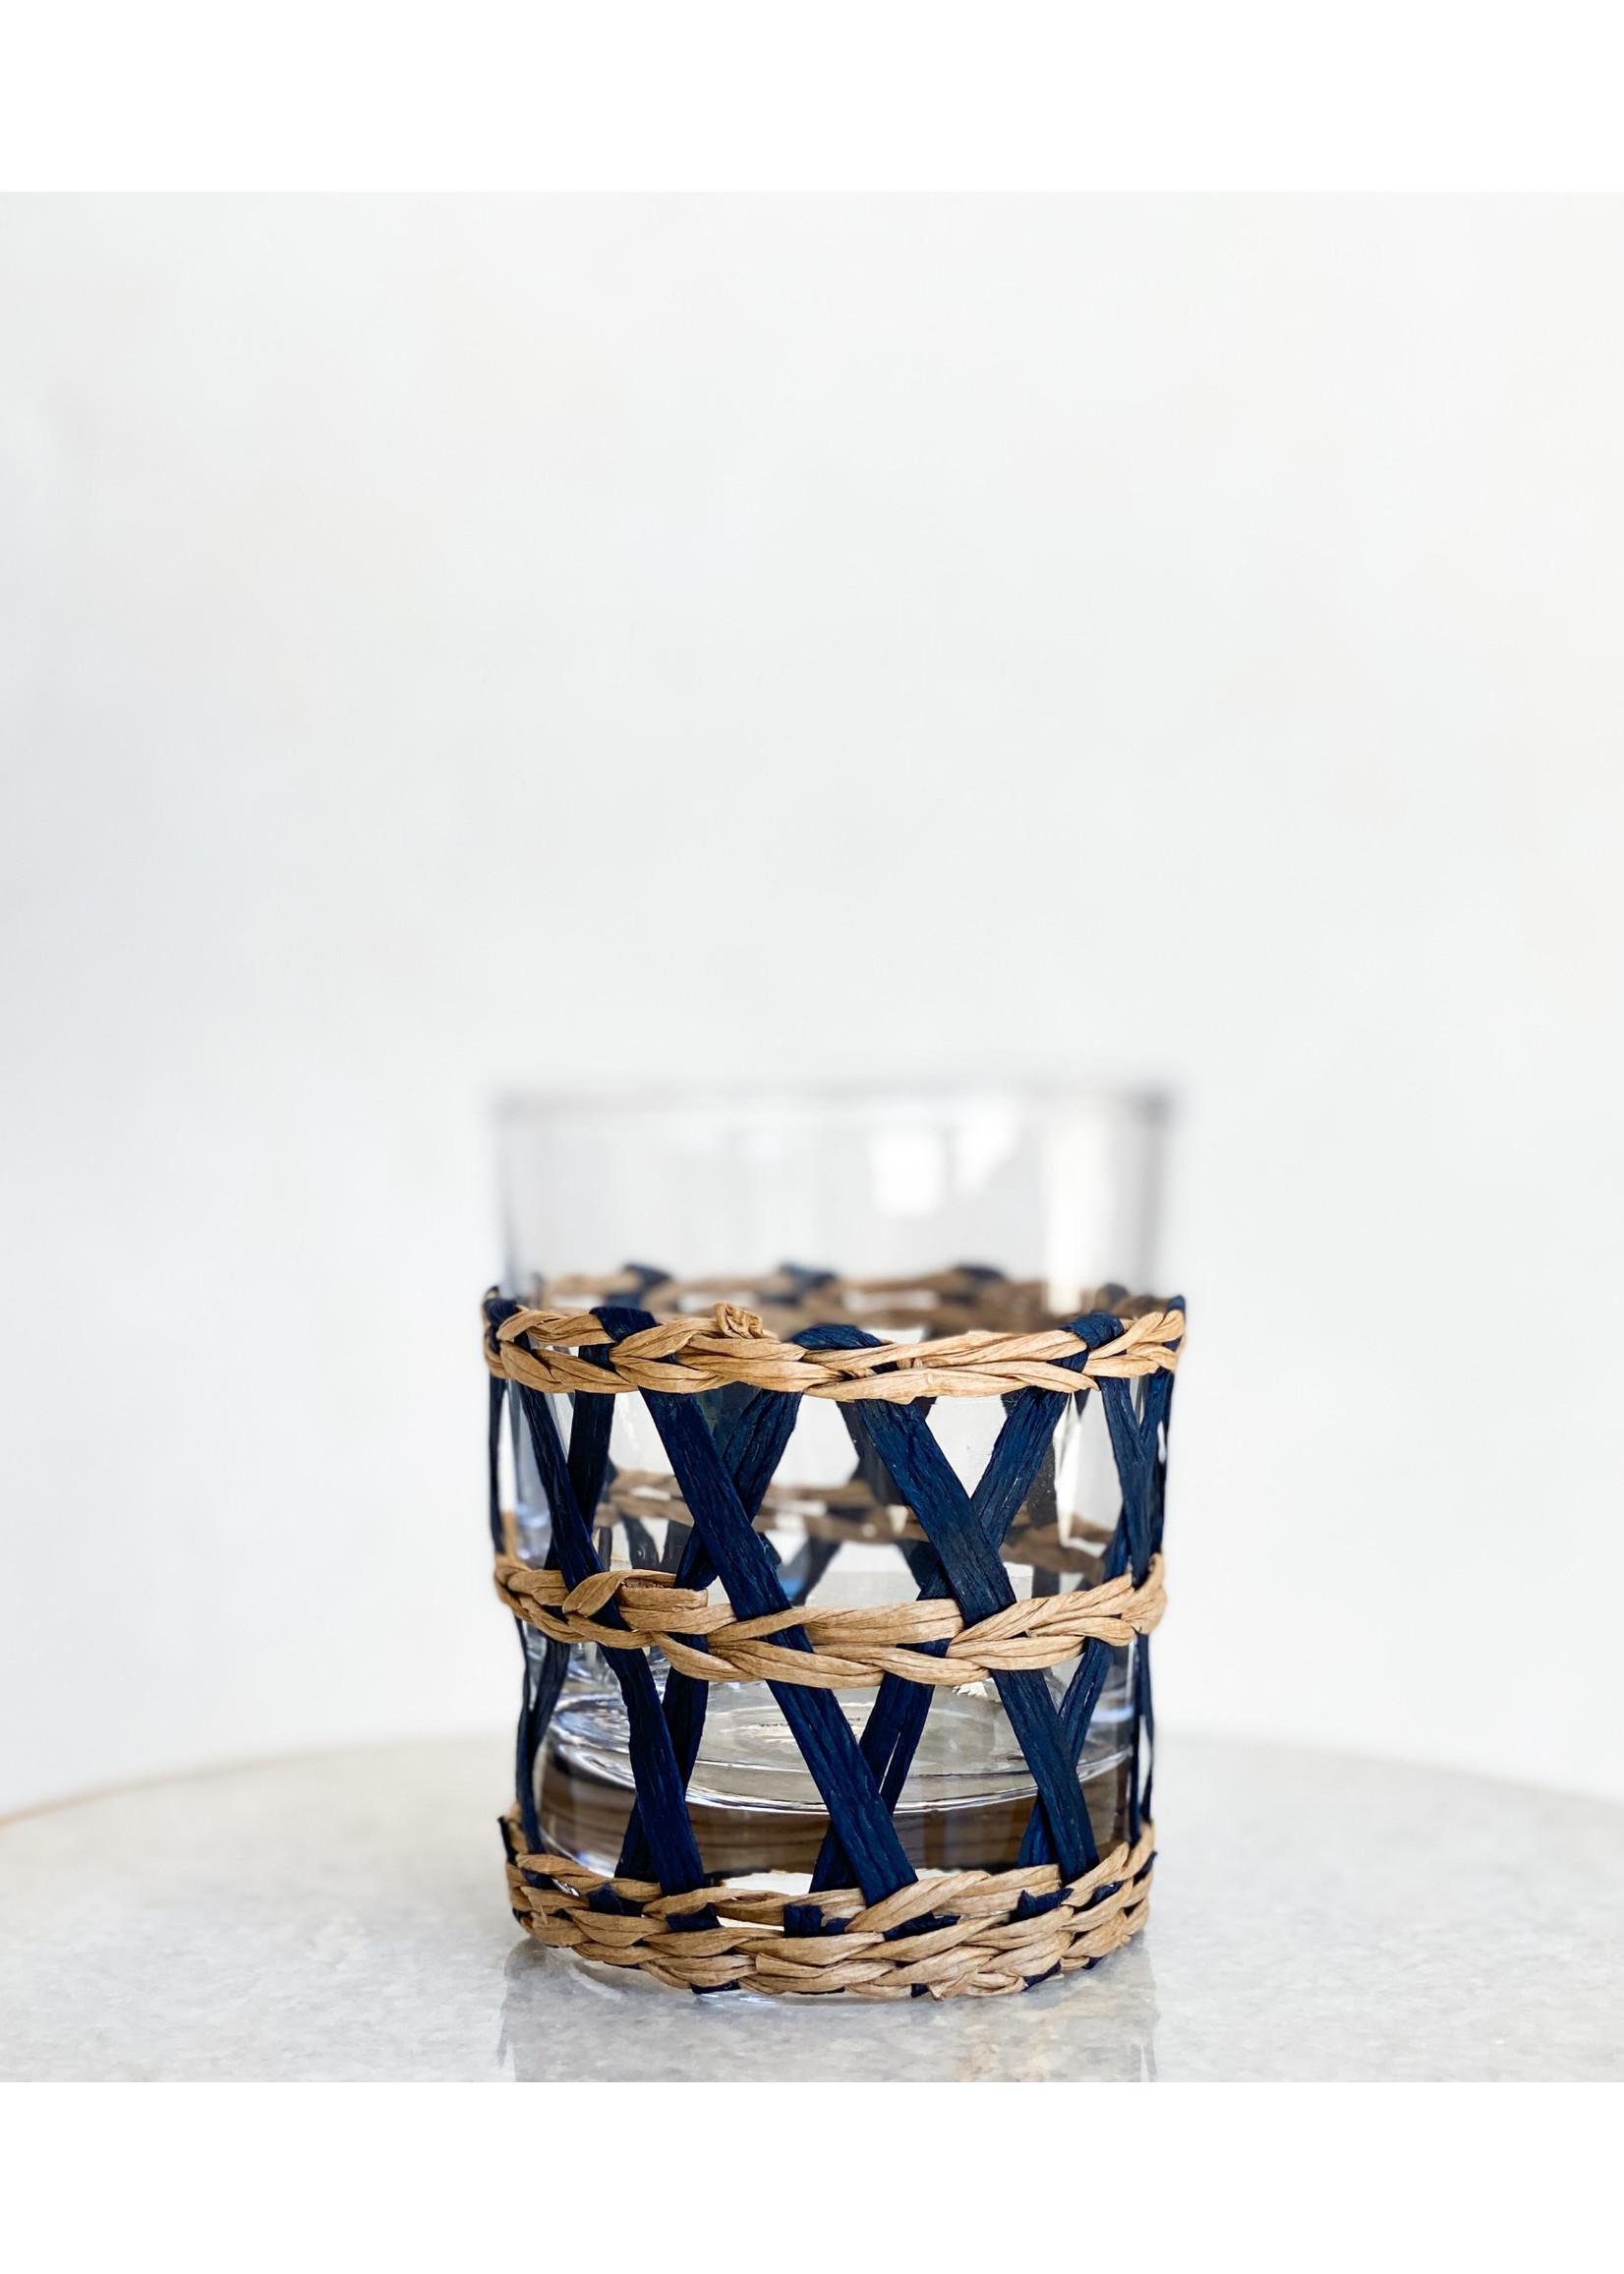 Amanda Lindroth Island Wrapped Tumbler Glass - Navy